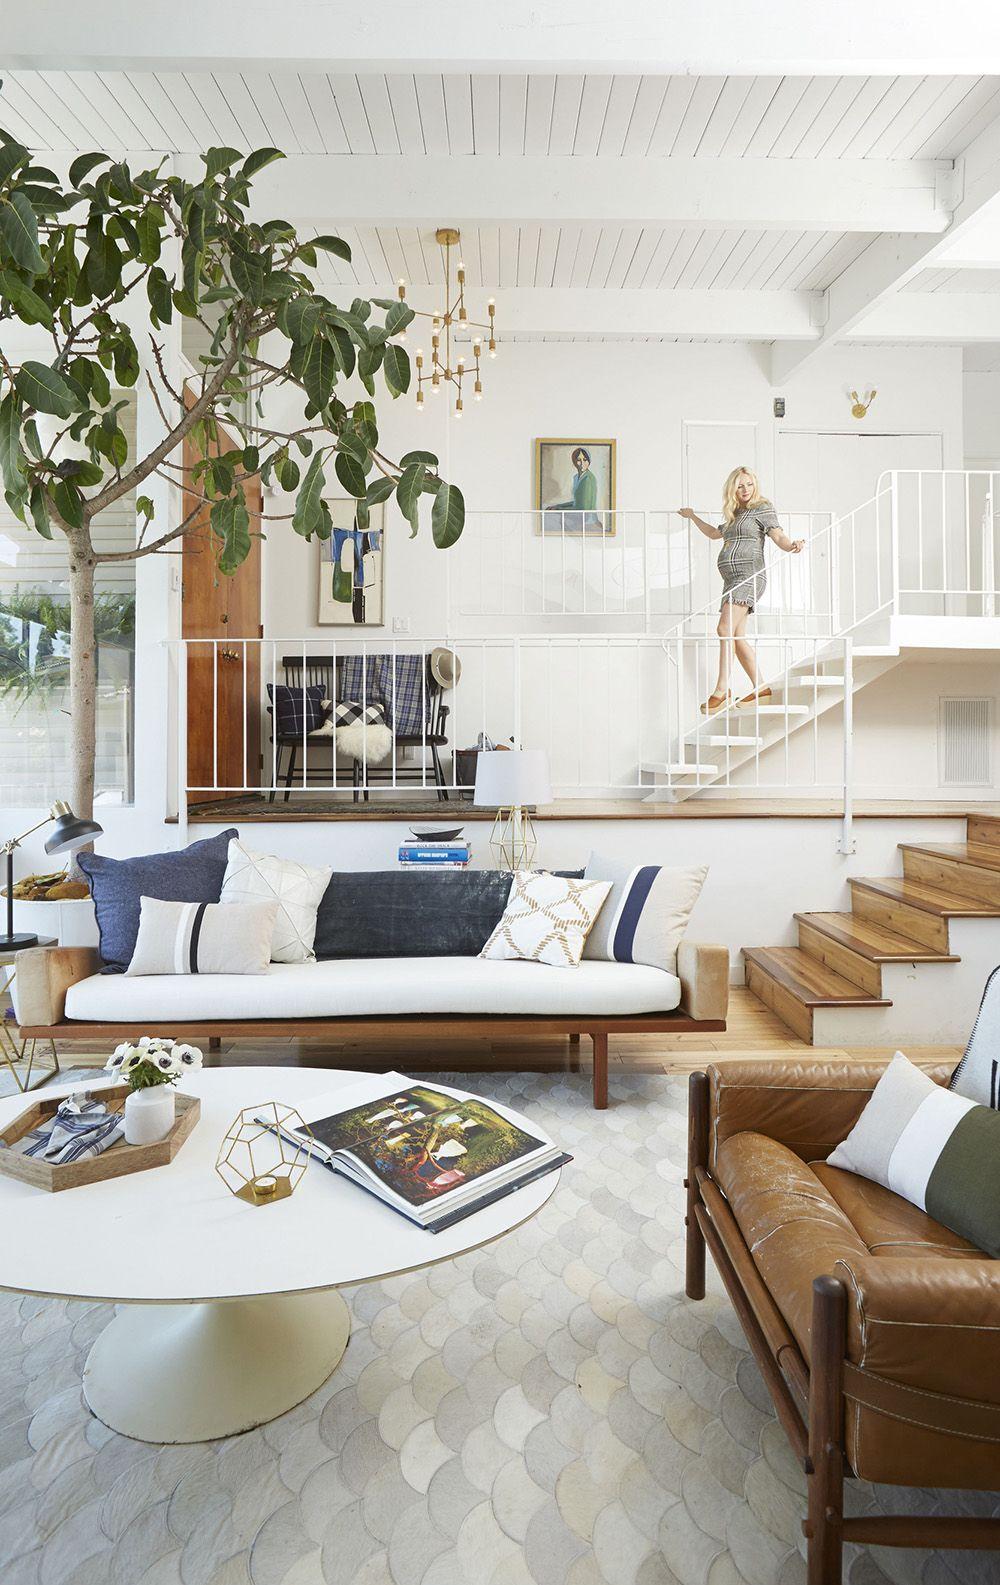 Image result for stylish interior design ideas also future     rh pinterest